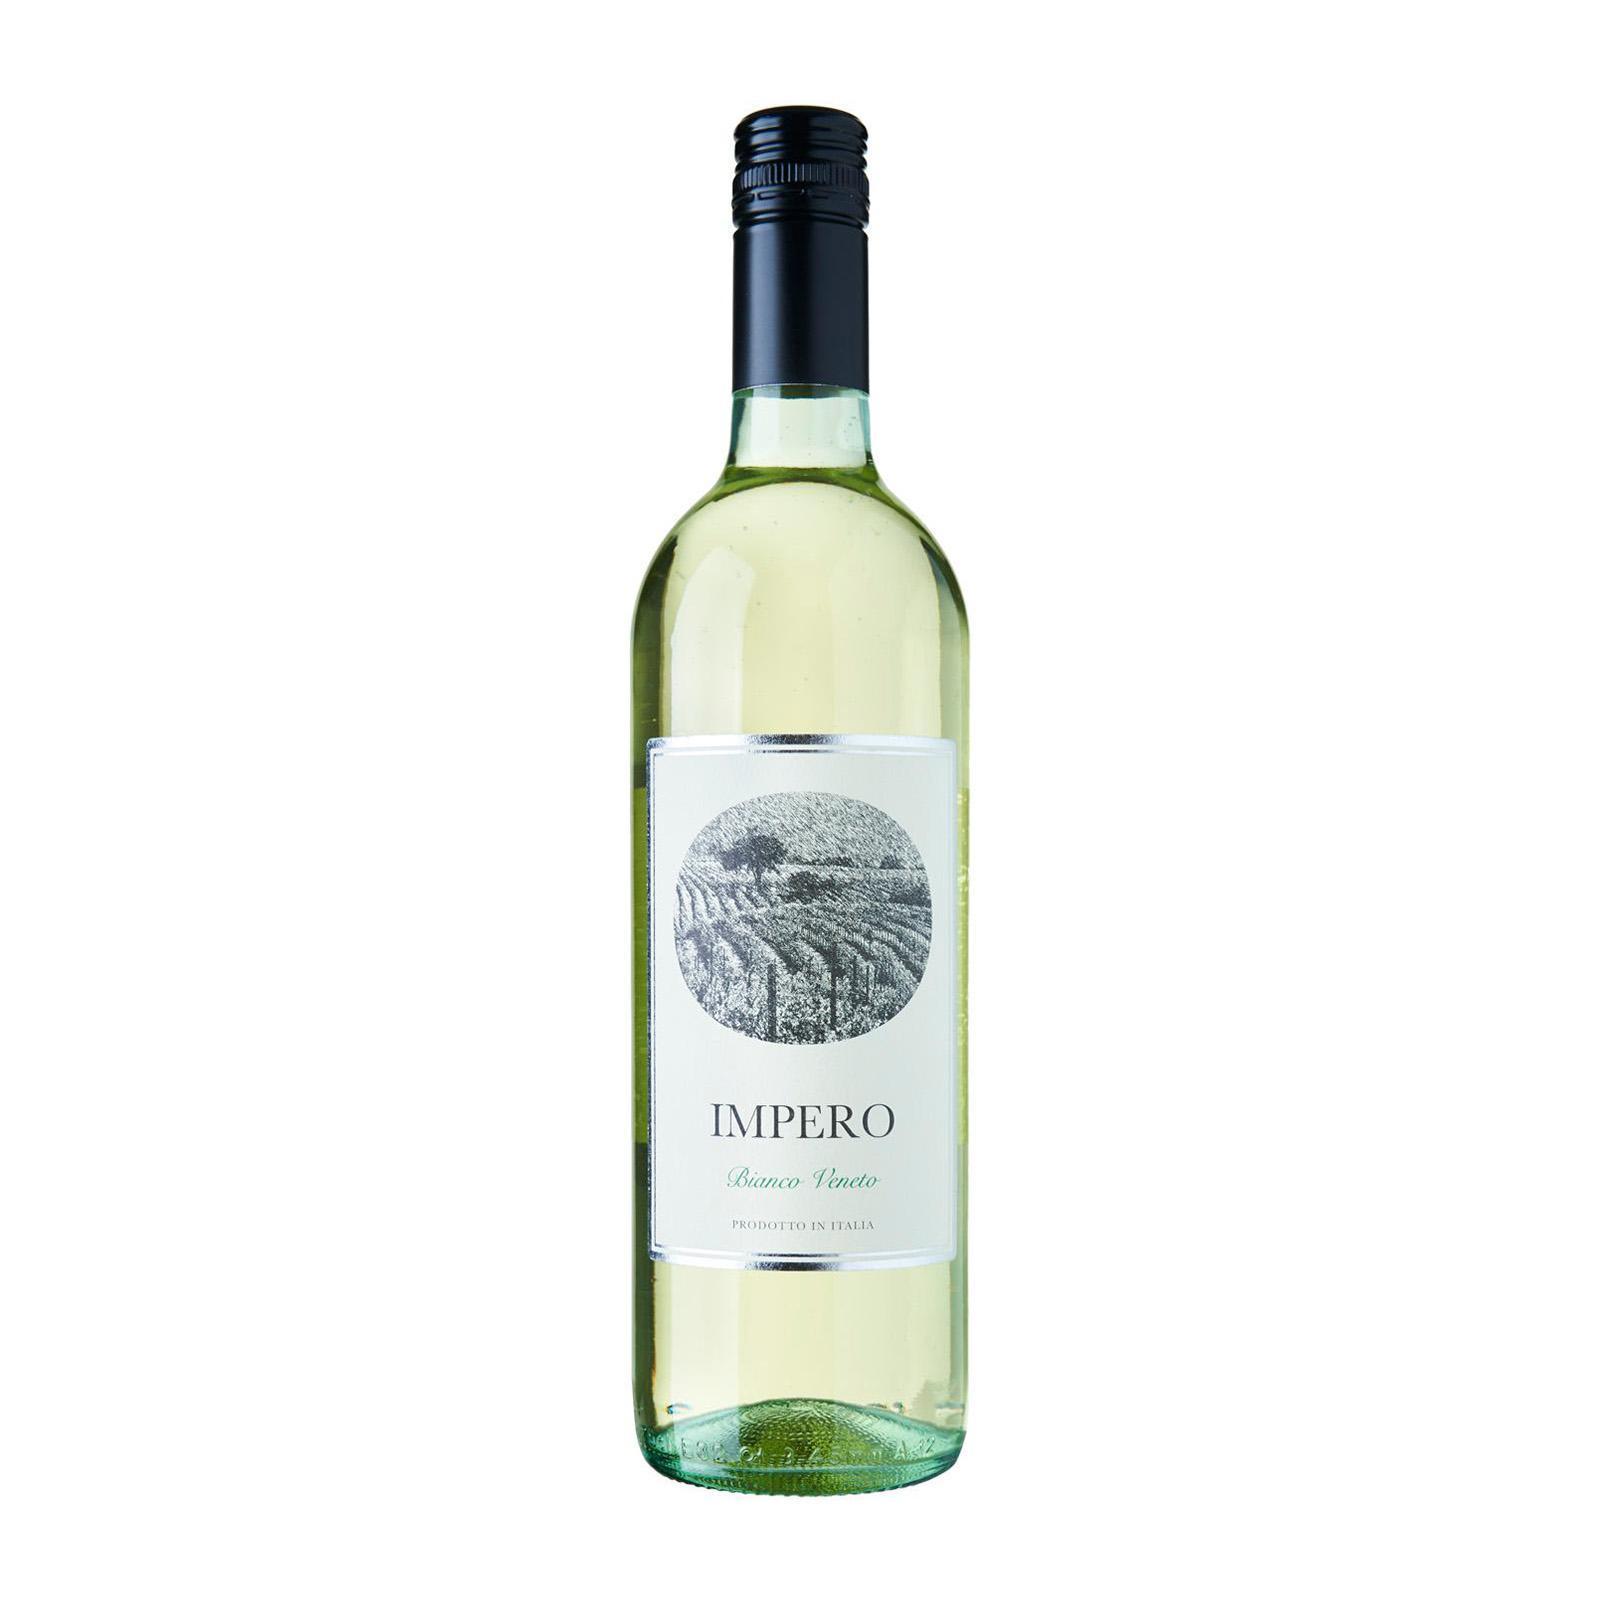 Impero Bianco Veneto - By Wines4you